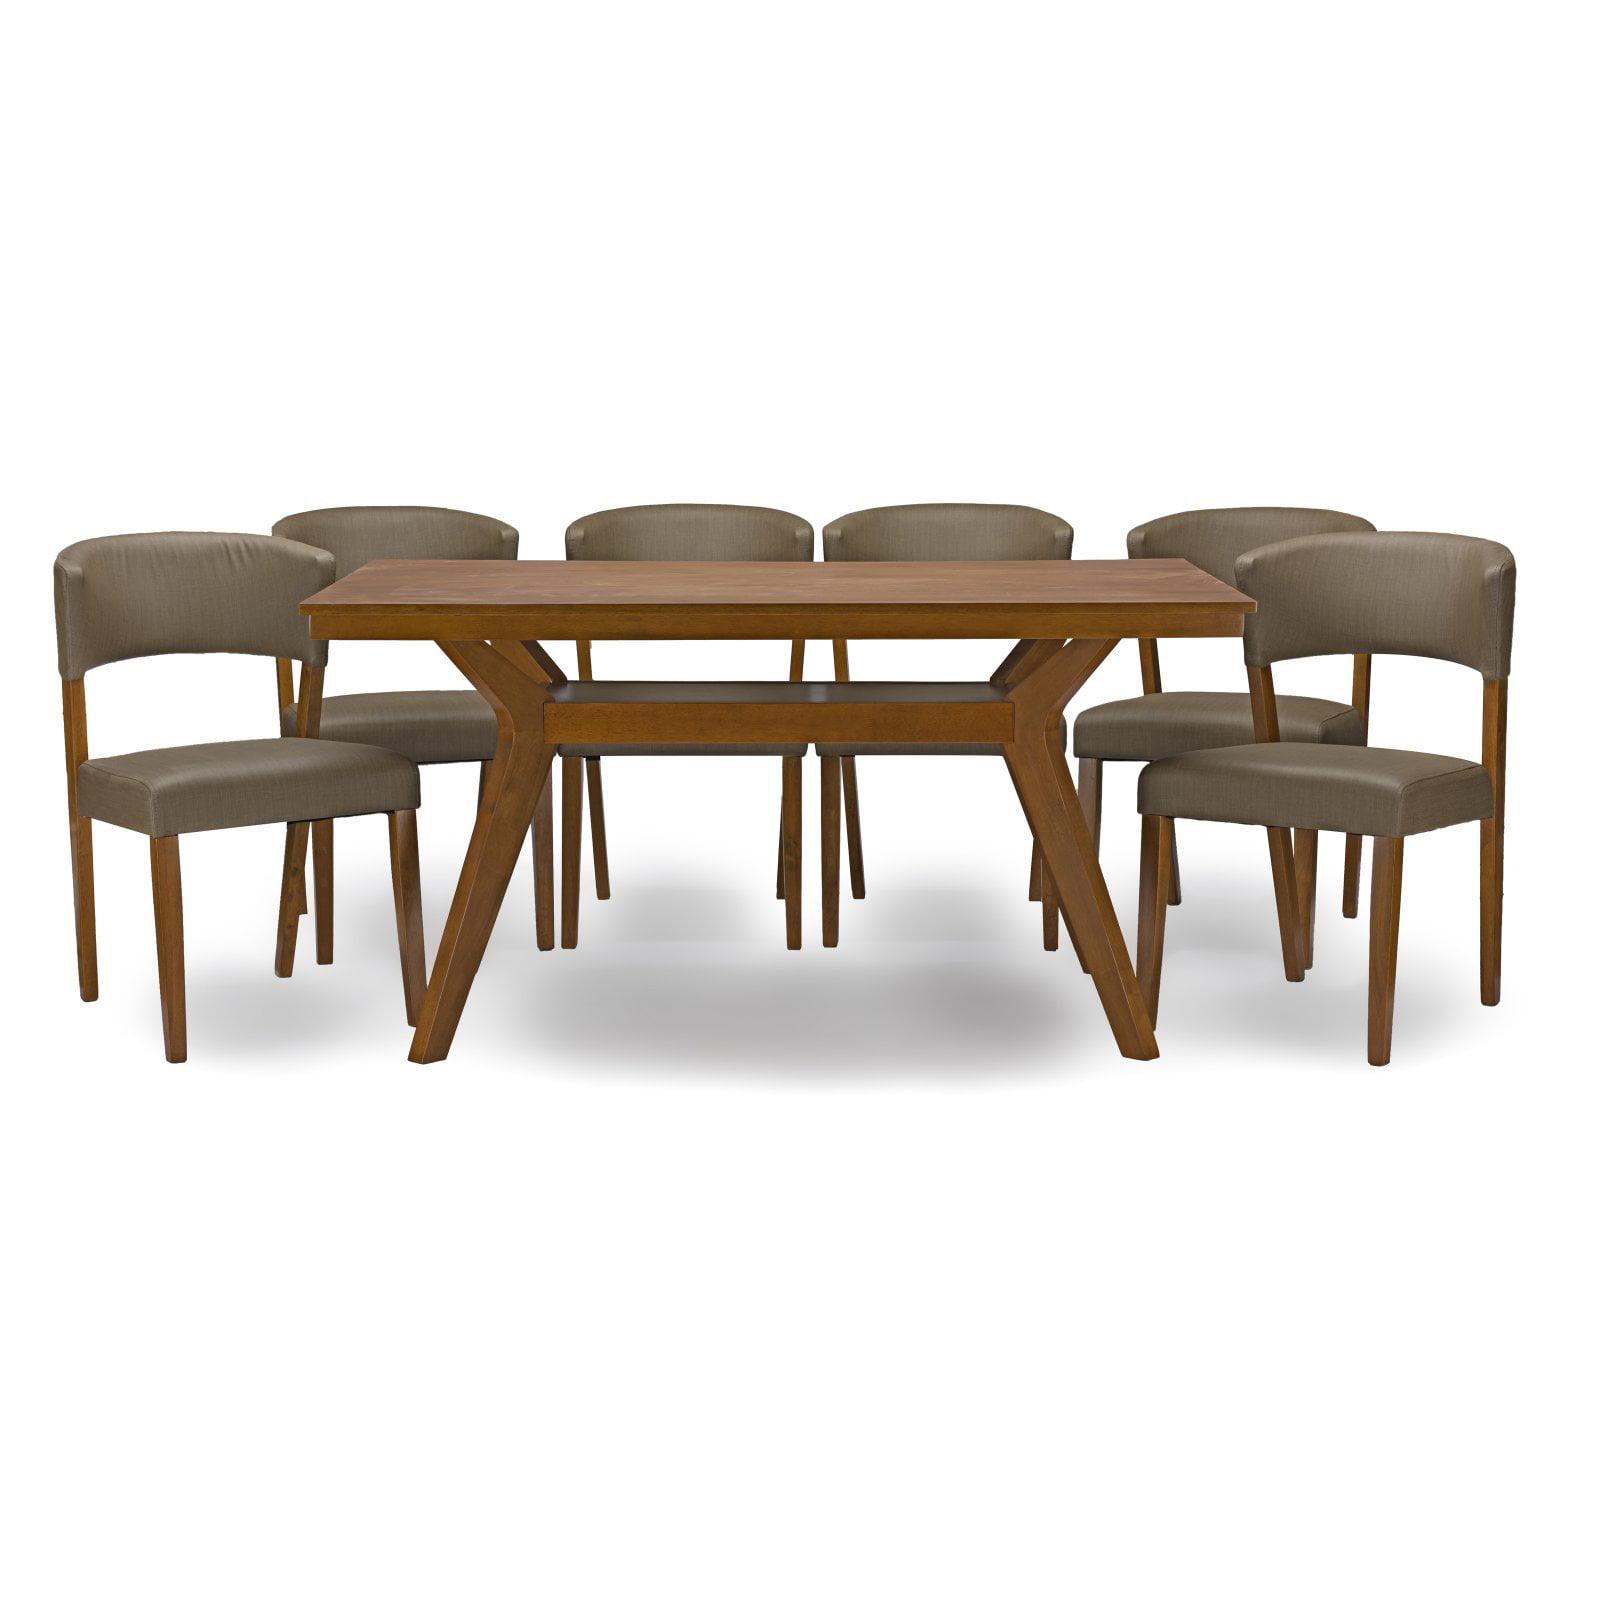 Baxton Studio Montreal 7 Piece Rectangular Dining Table Set